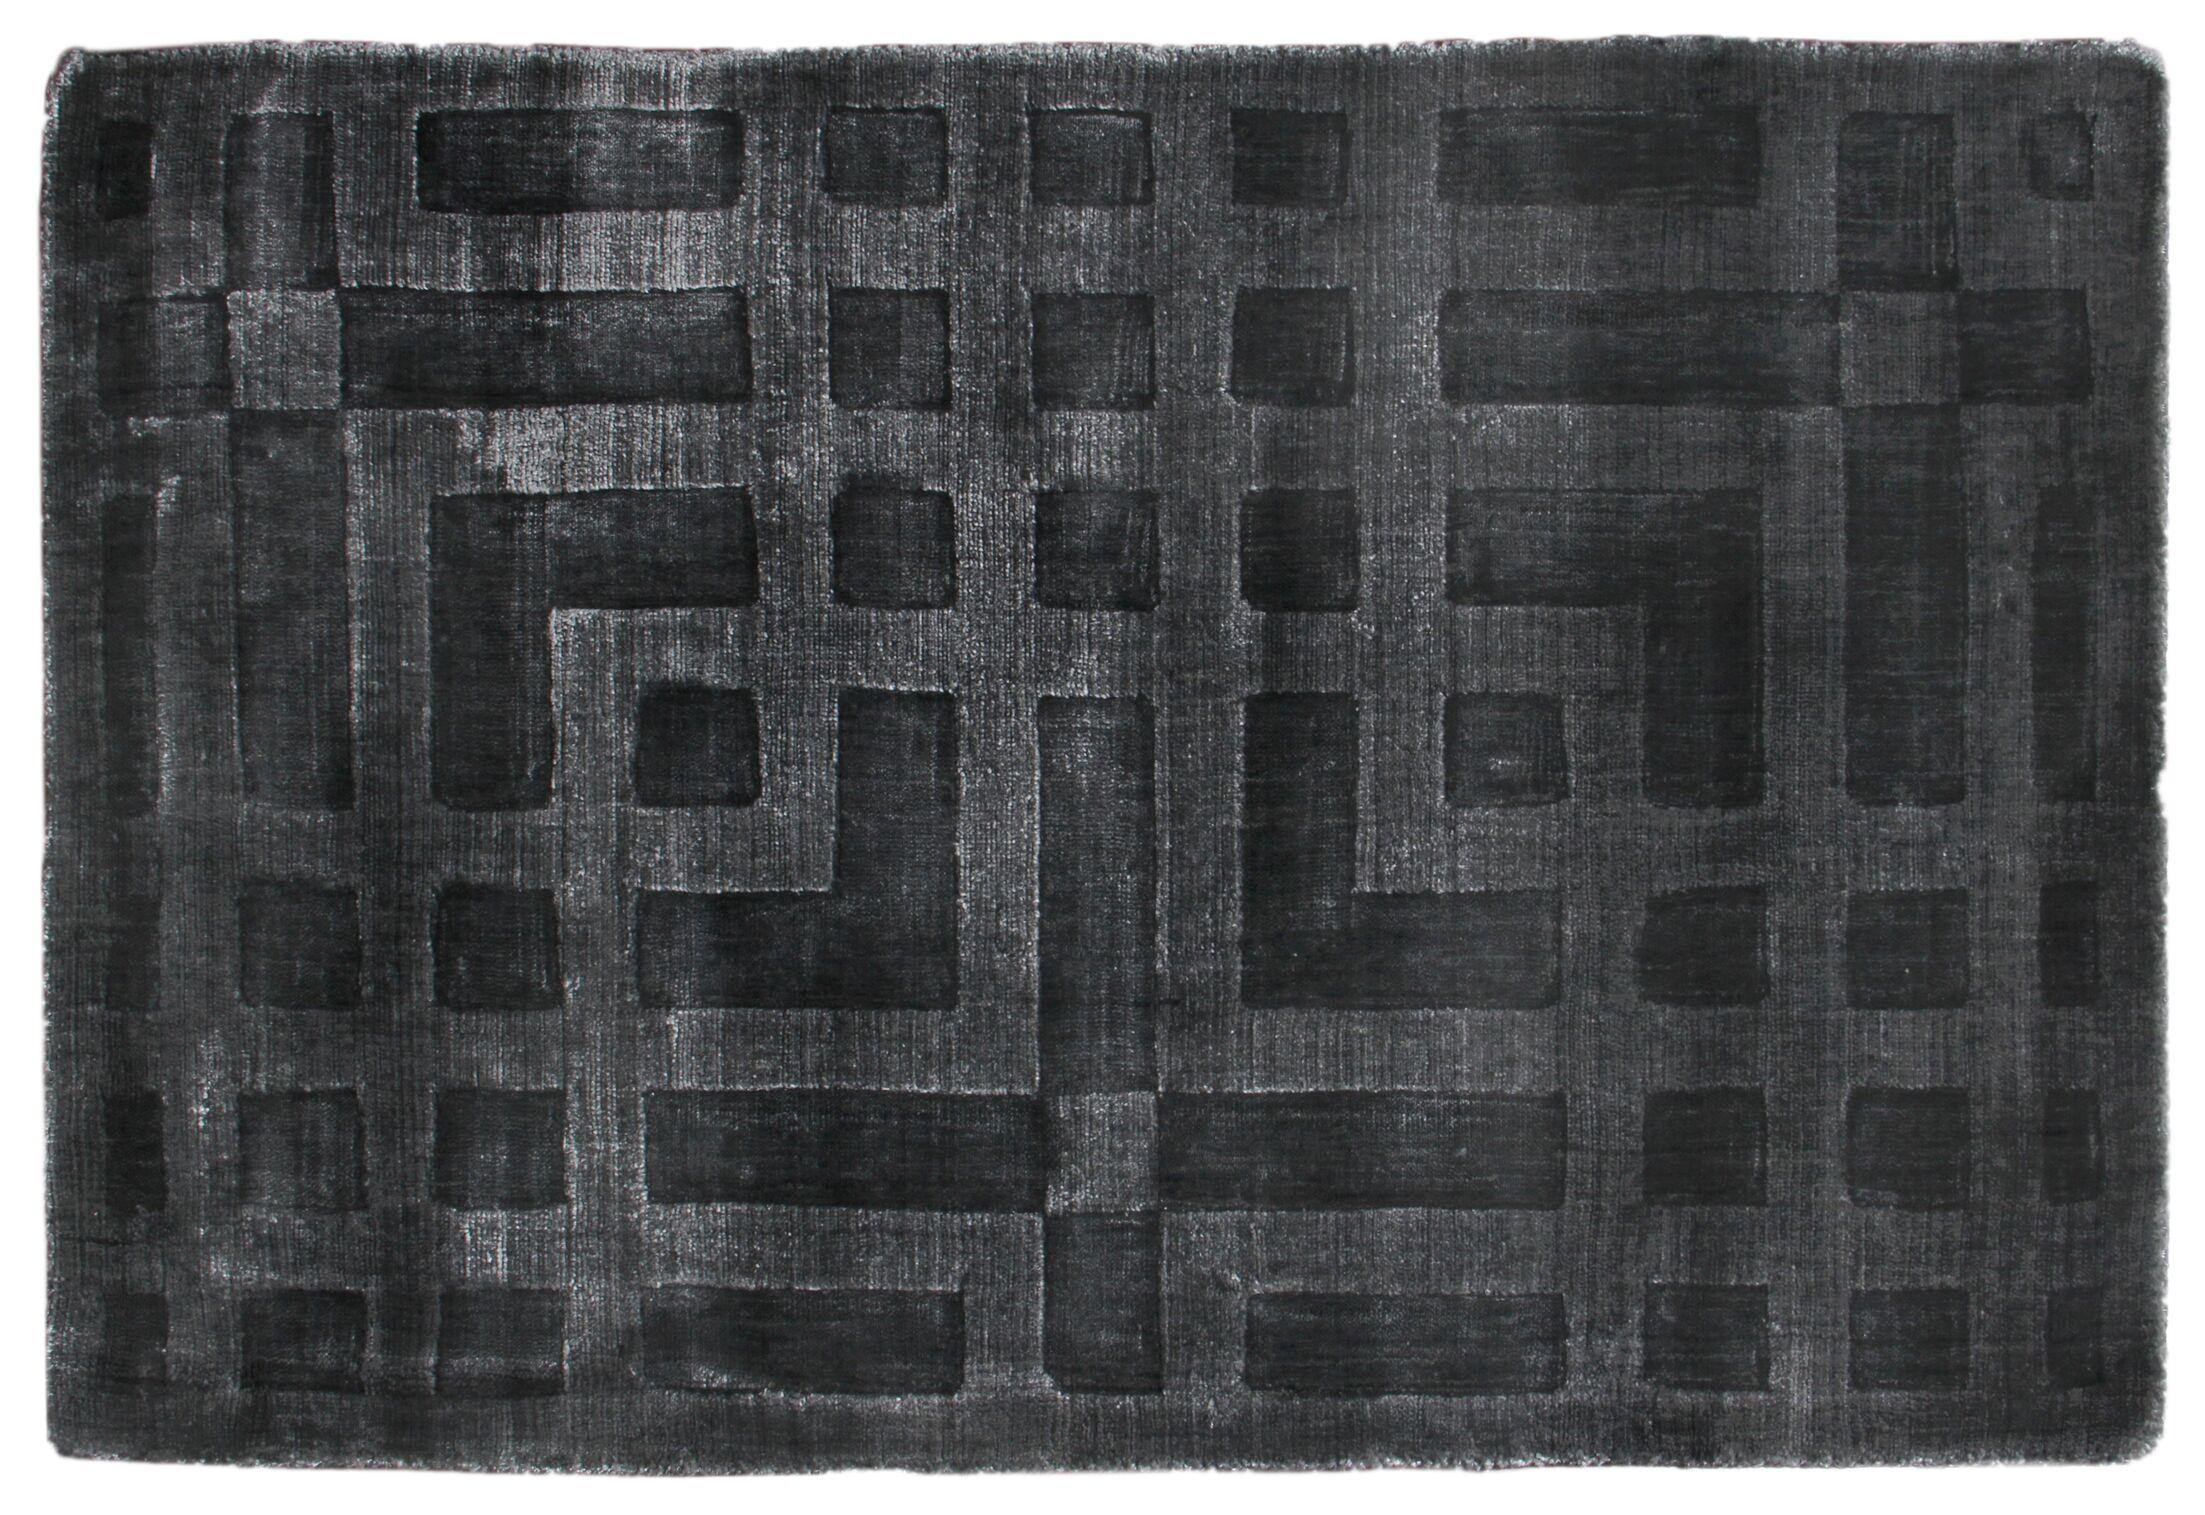 Hazel Hand-Woven Dark Gray Area Rug Rug Size: Rectangle 10' x 14'